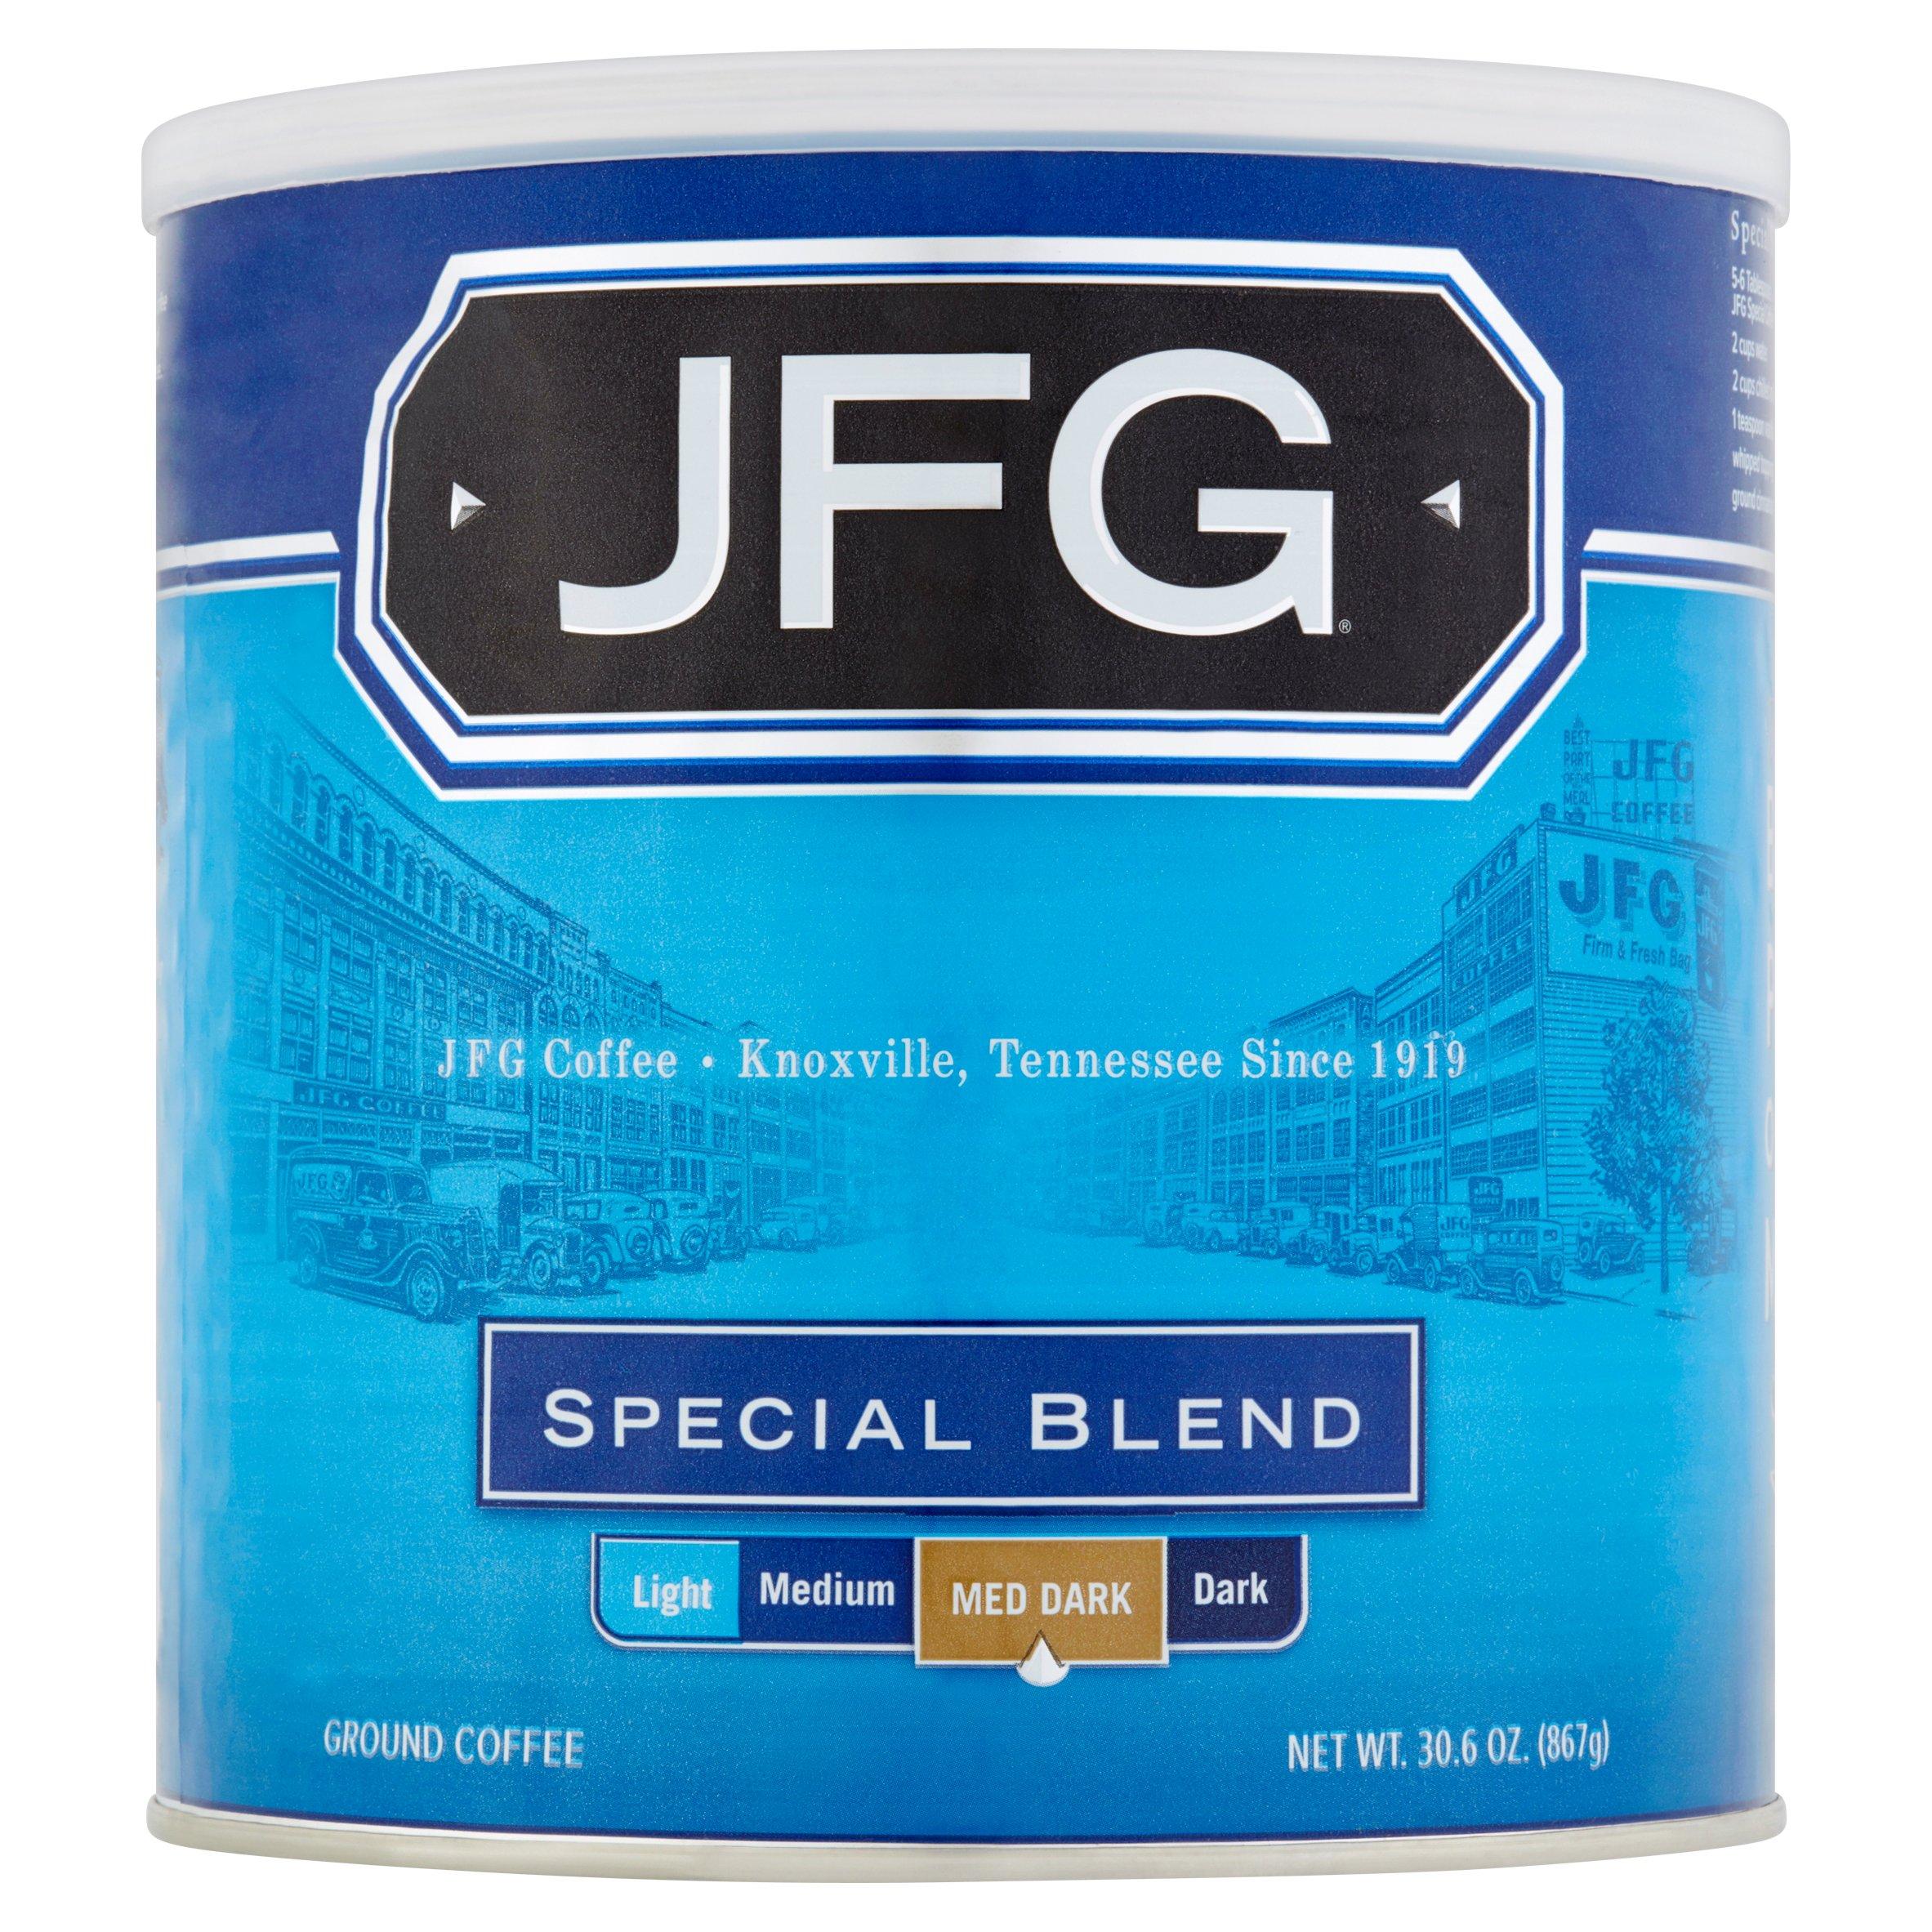 JFG Special Blend Ground Coffee, 30.6 oz